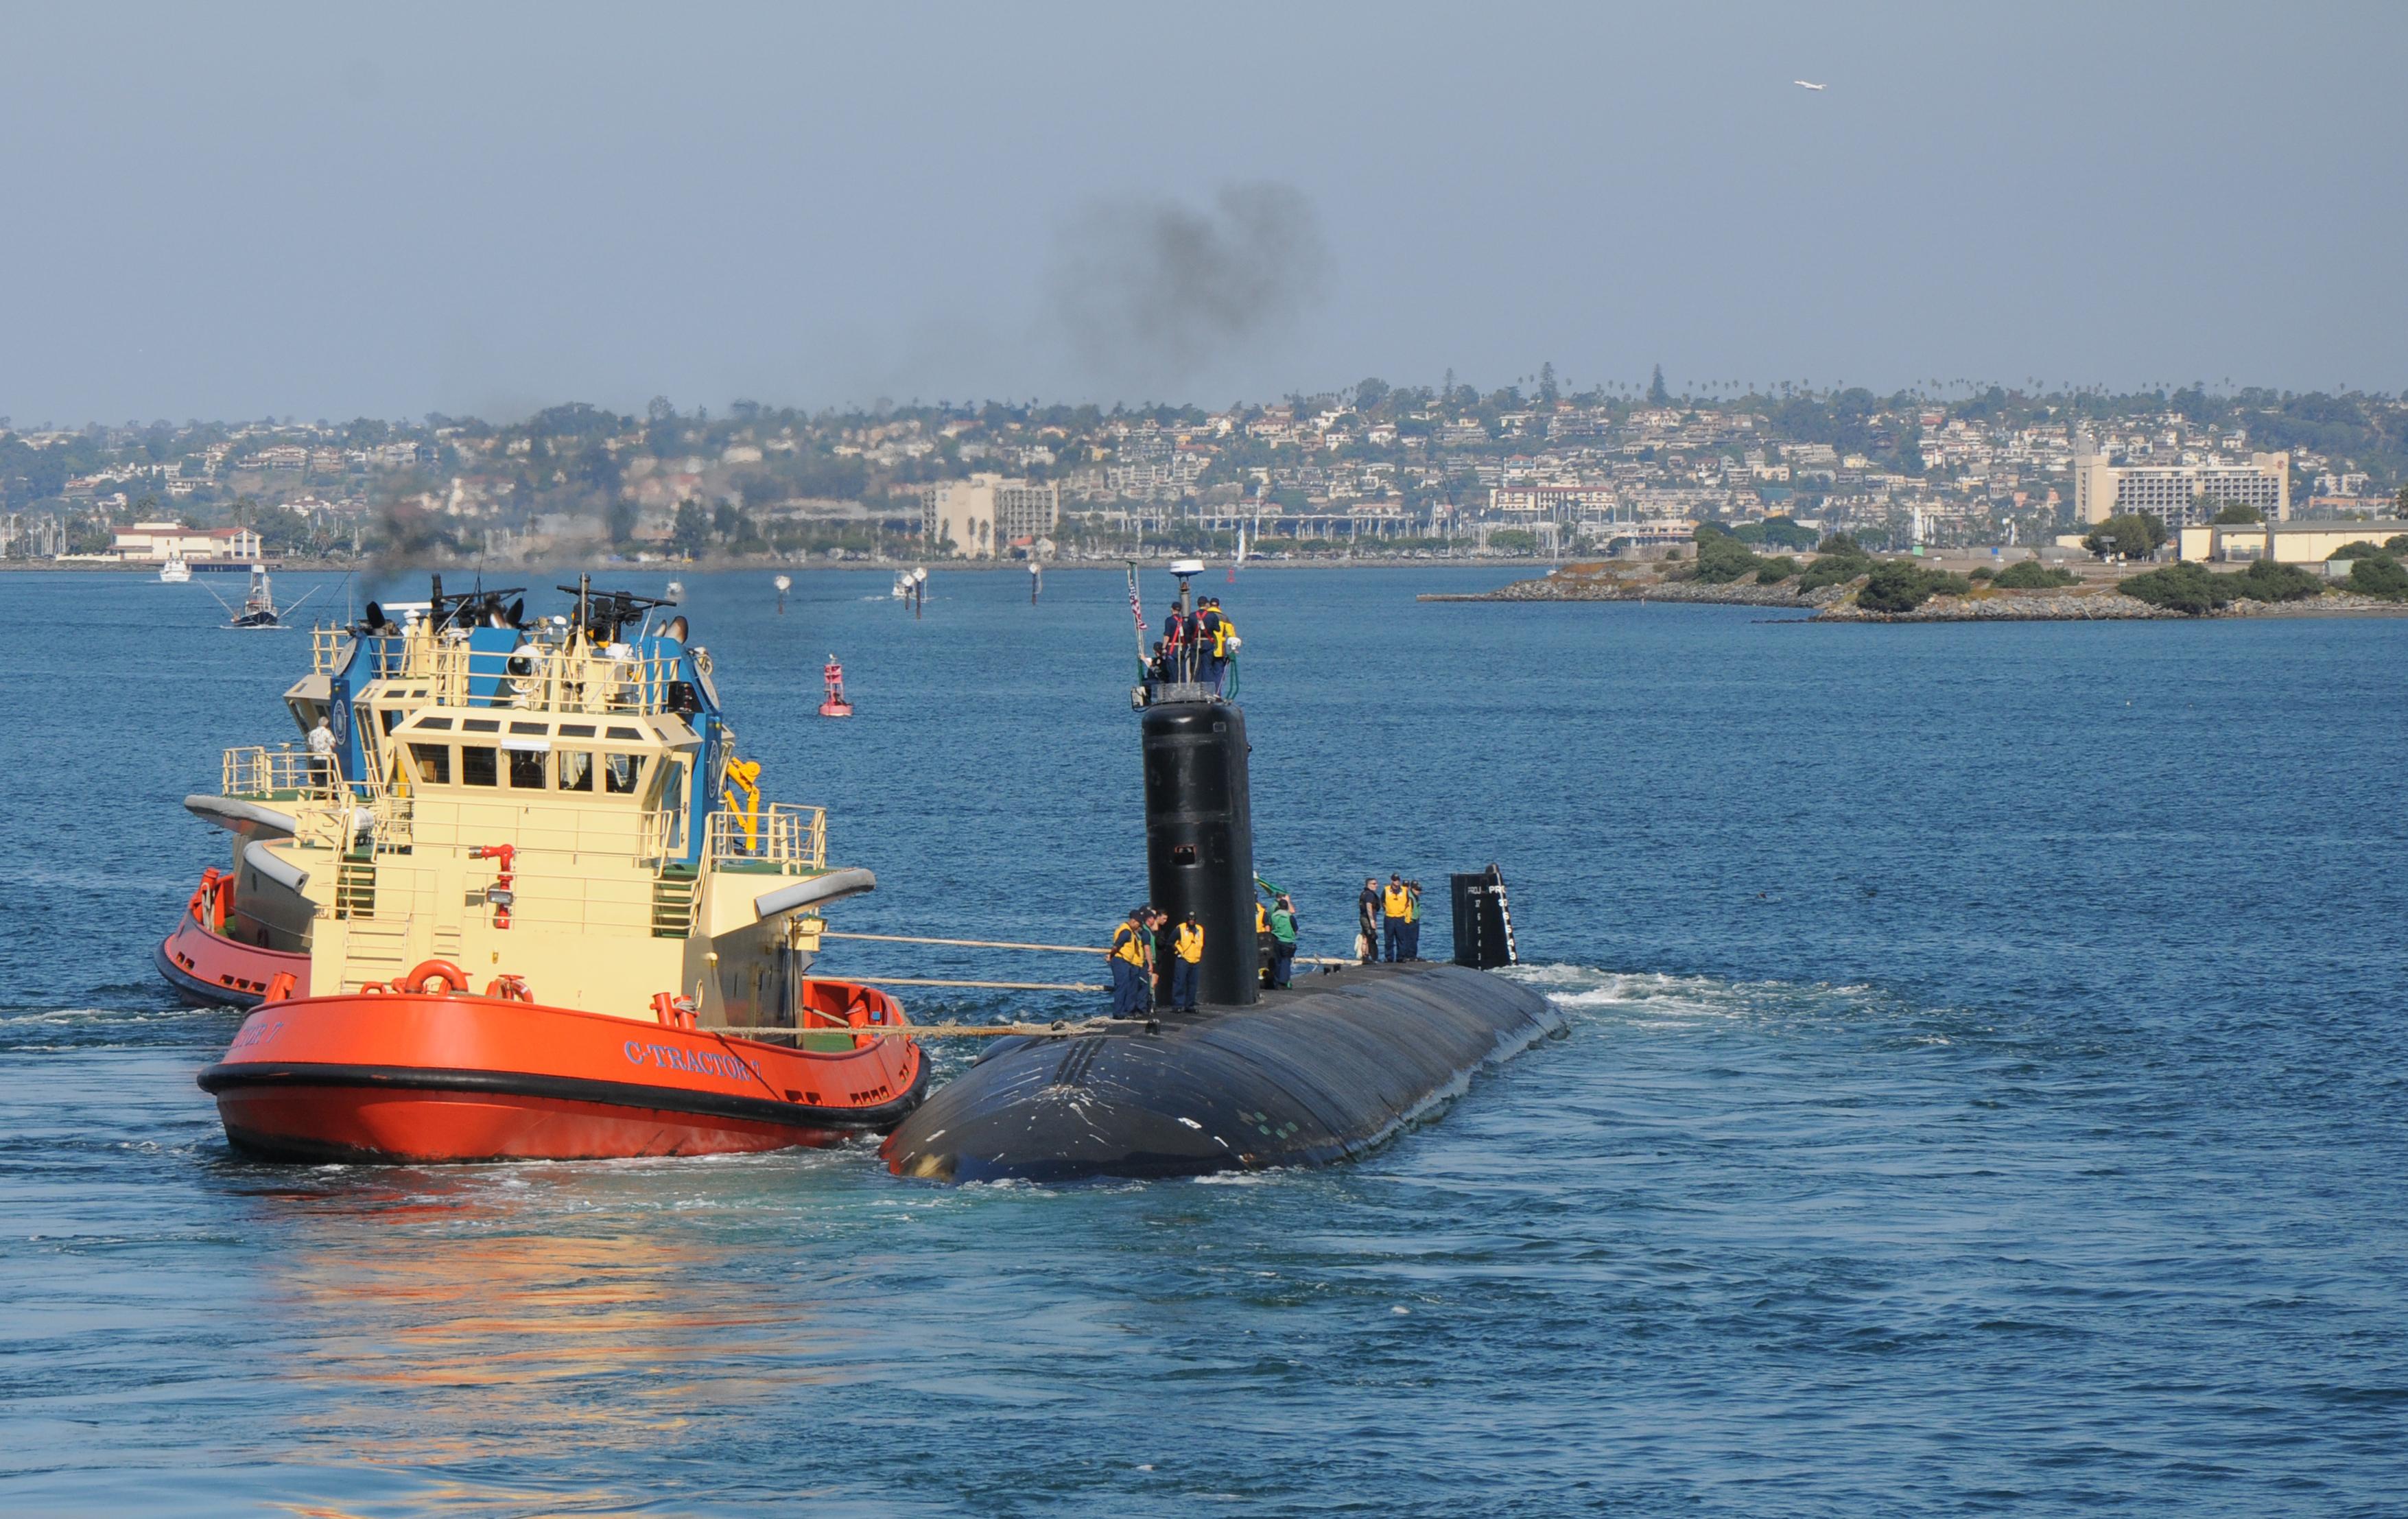 USS TOPEKA SSN-754 Auslaufen San Diego 02.11.2012Bild: U.S. Navy